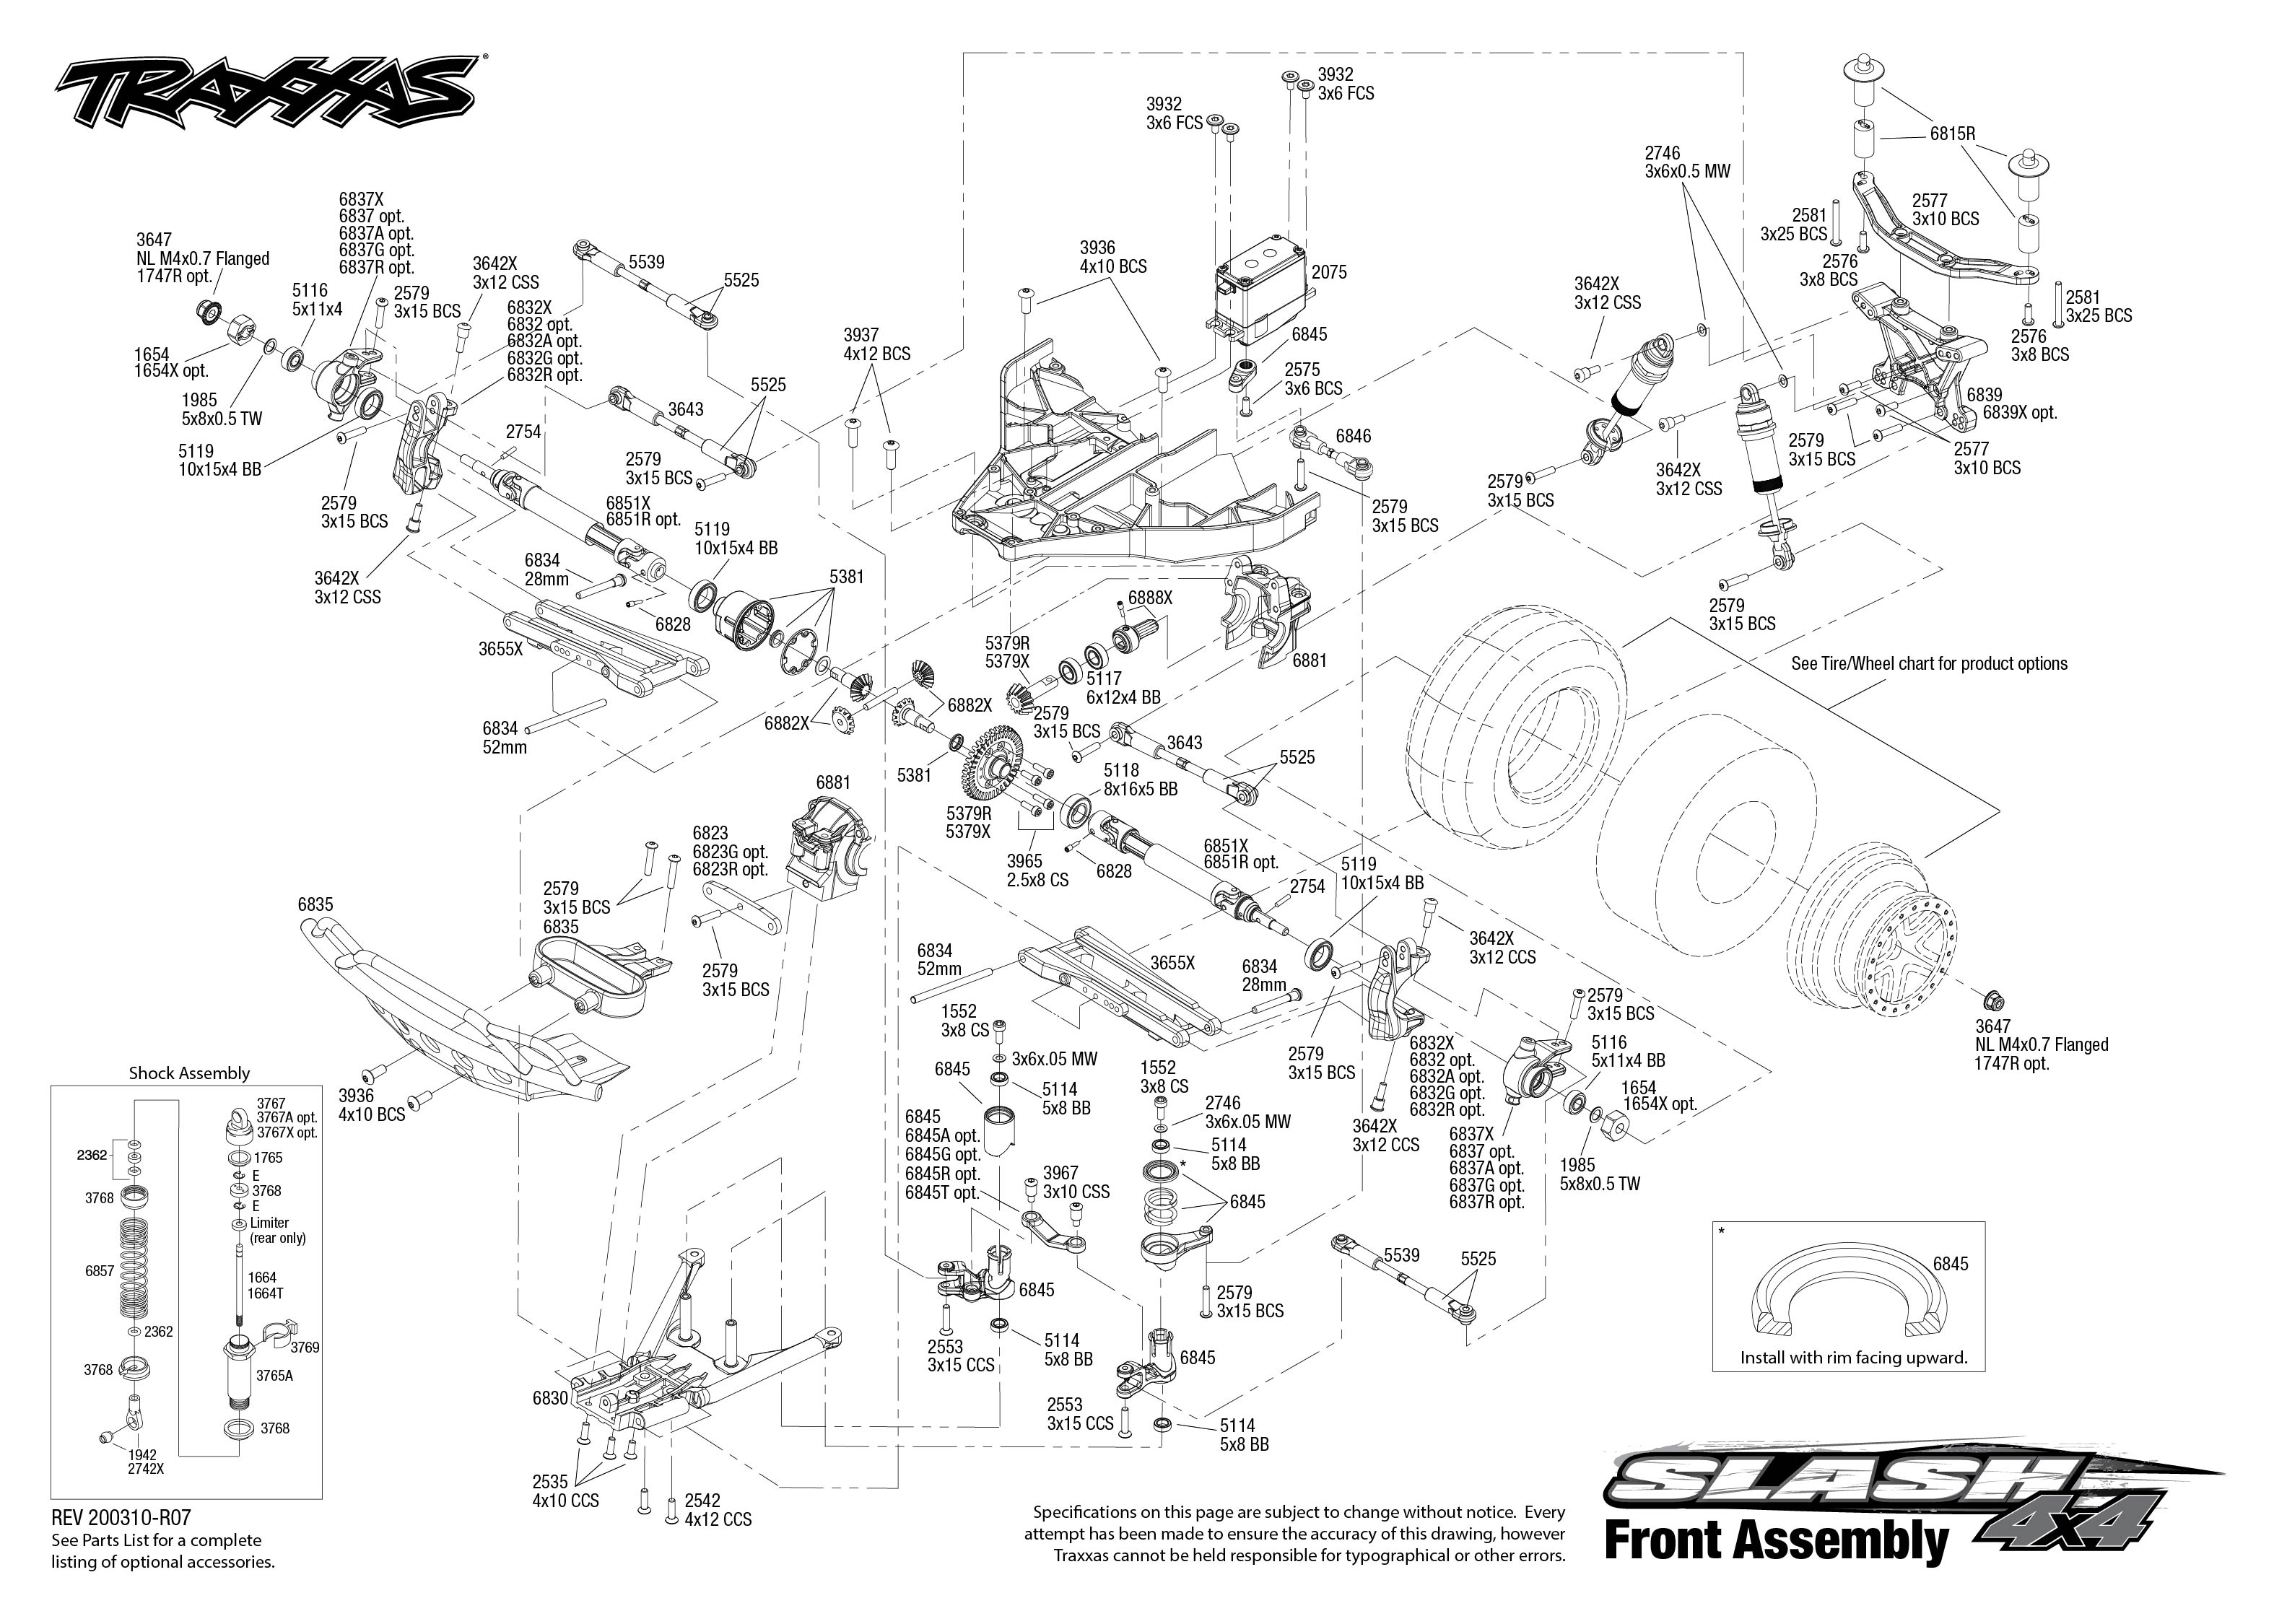 Traxxas 1/10 Slash 4WD Brushless RTR Short Course Truck